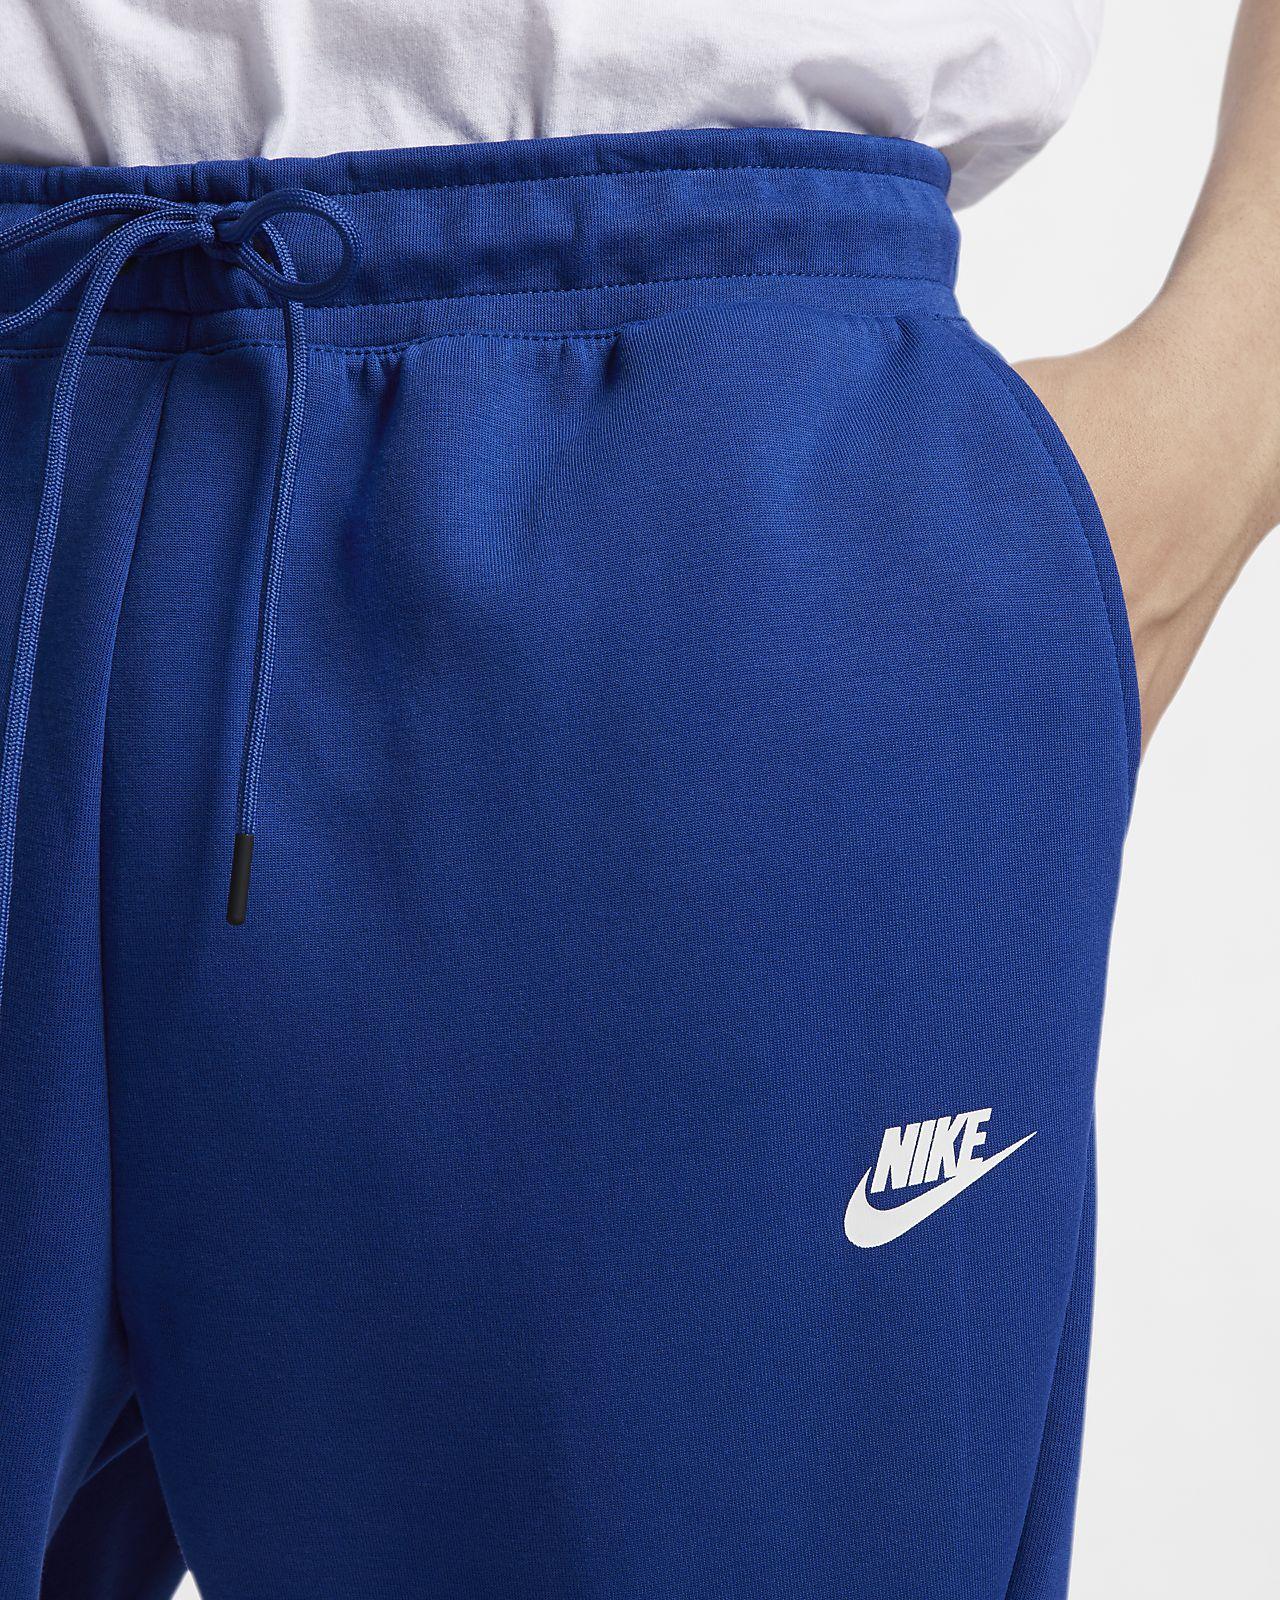 d8f2b7a992f9a Nike Sportswear Tech Fleece Herren-Jogger. Nike.com AT